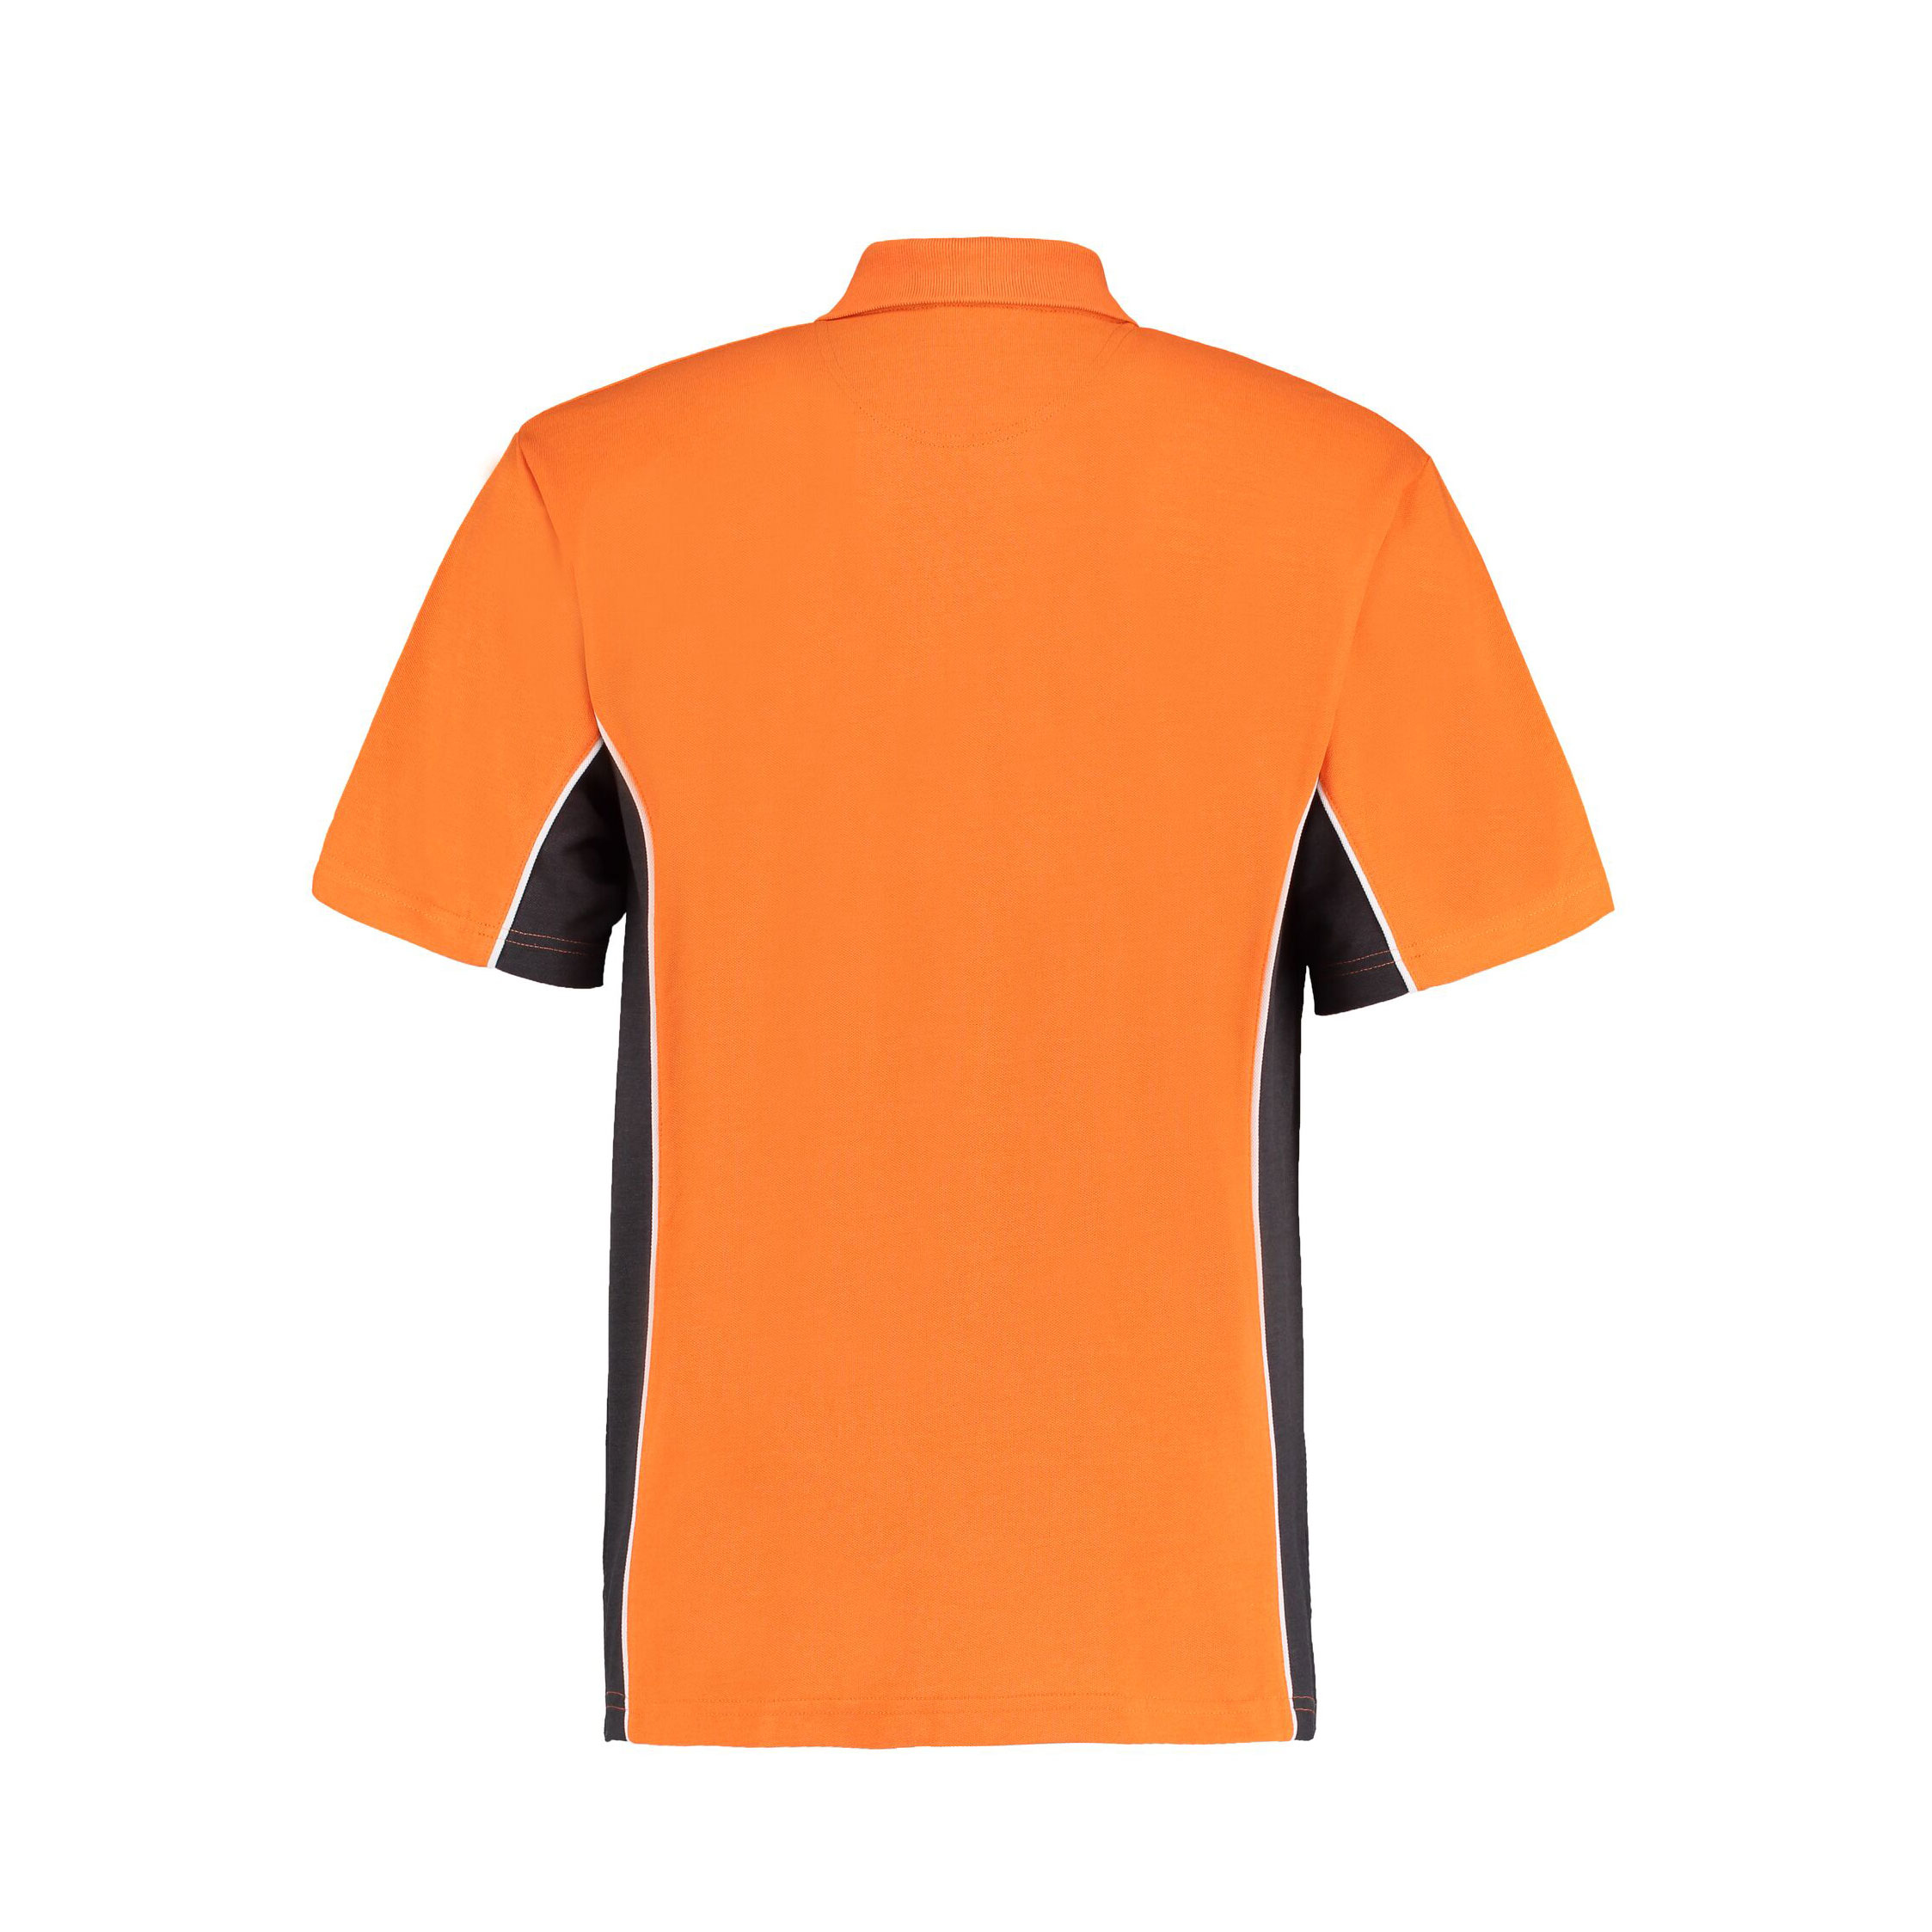 05_kk475_orange_graphite_blanc--0-0--a70c55ba-5cb5-45fd-a5a5-c84776544ca0